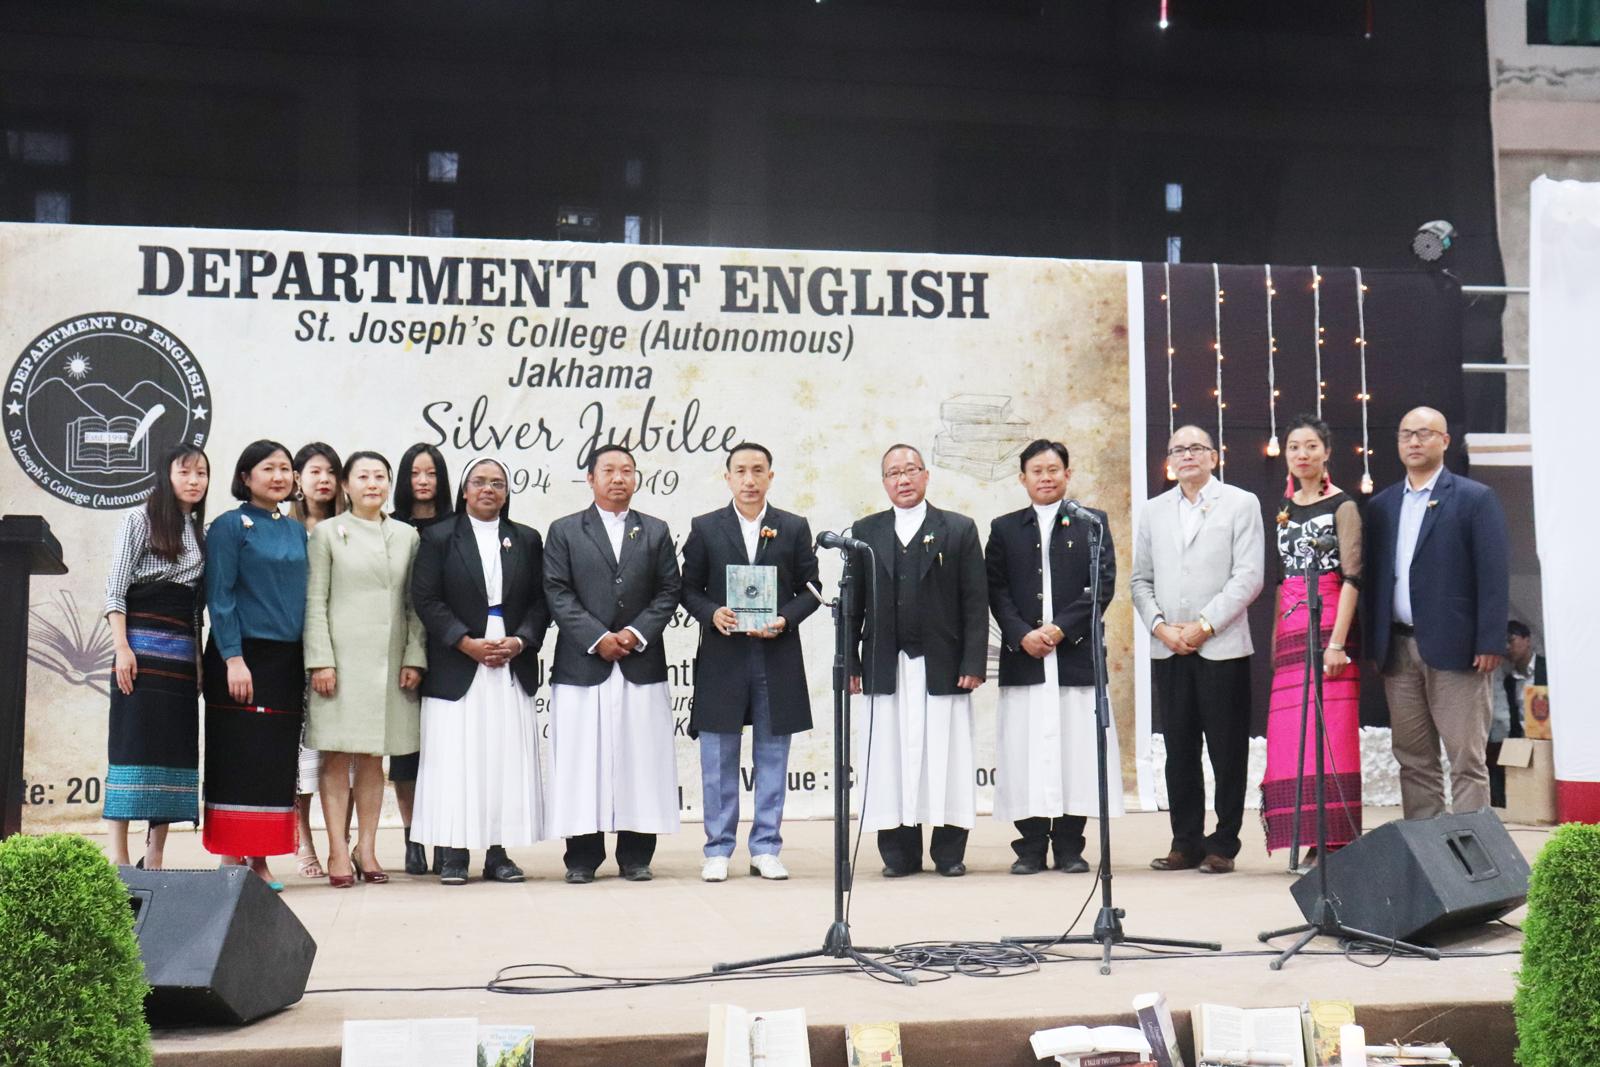 English dept of St. Joseph's College Jakhama celebrates silver jubilee